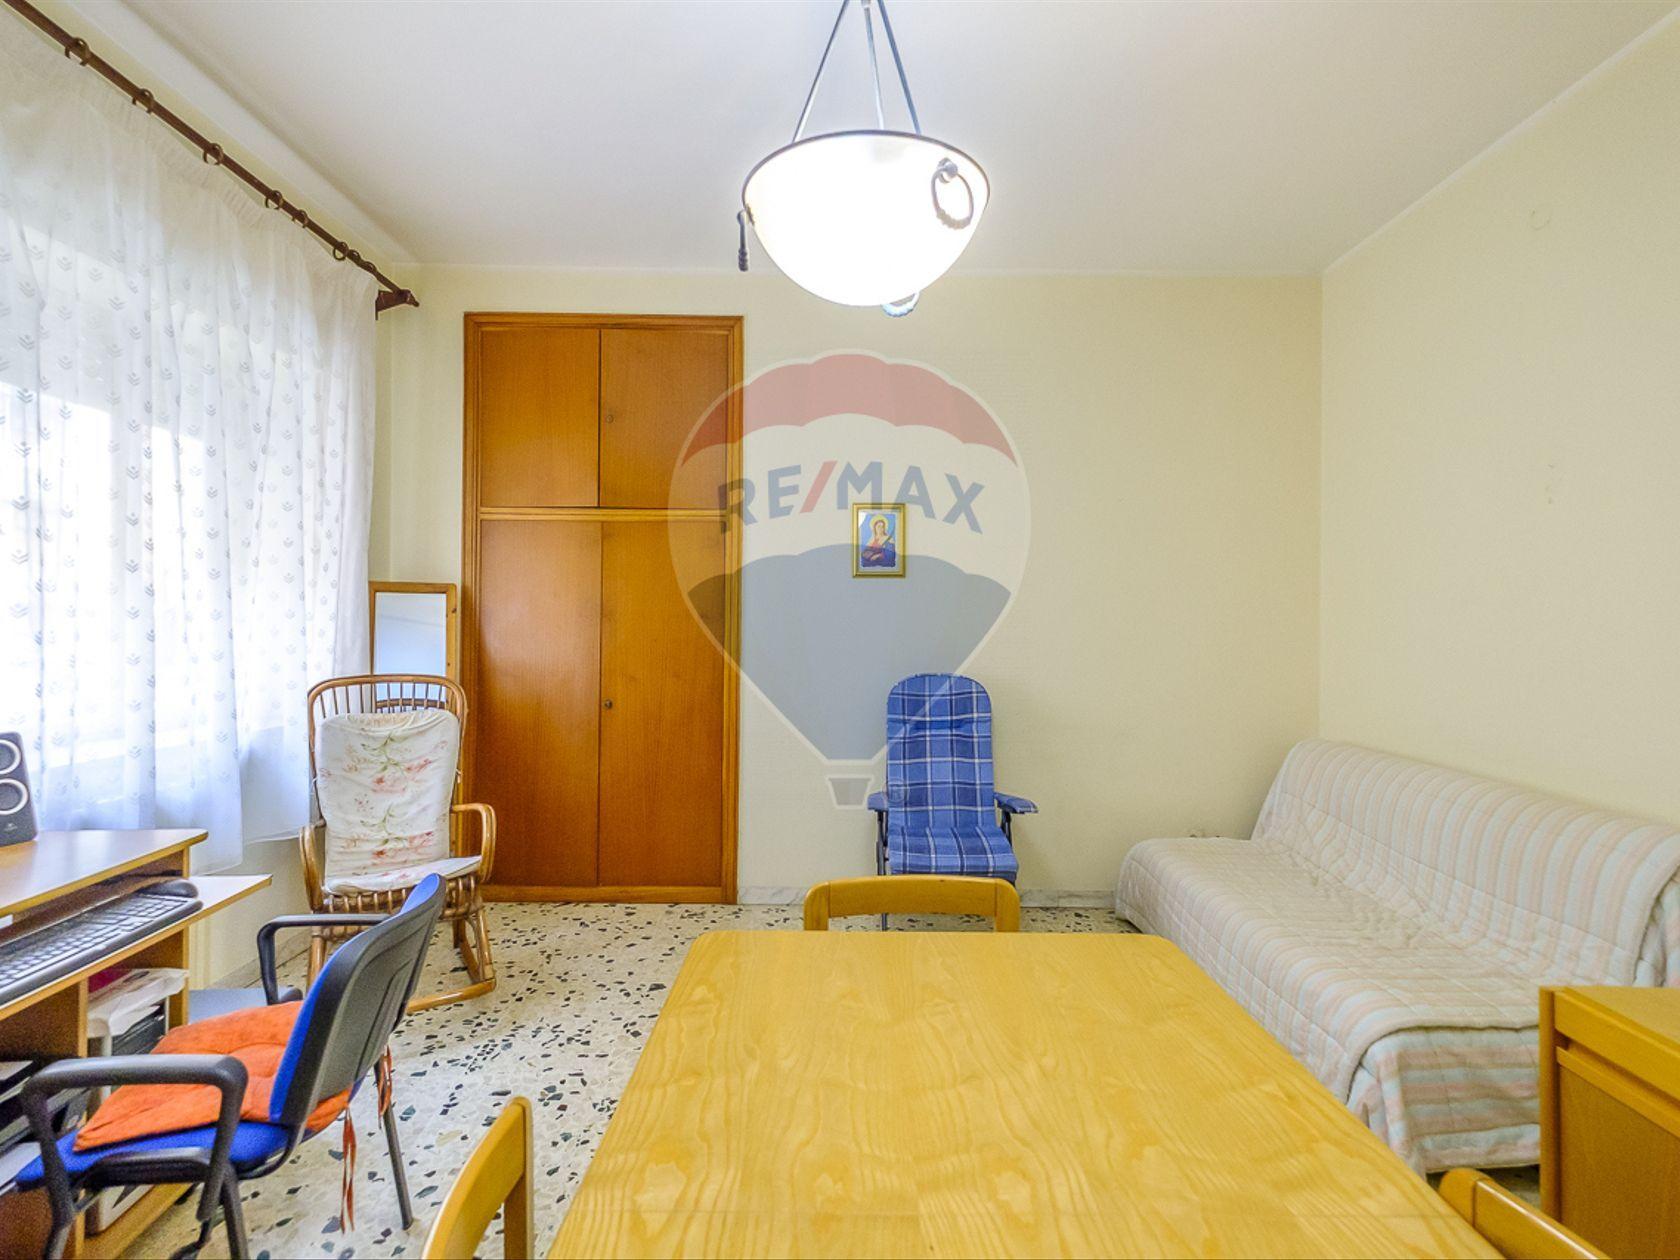 Appartamento Siracusa- Scala Greca S. Panagia Teracati Zecchino, Siracusa, SR Vendita - Foto 5